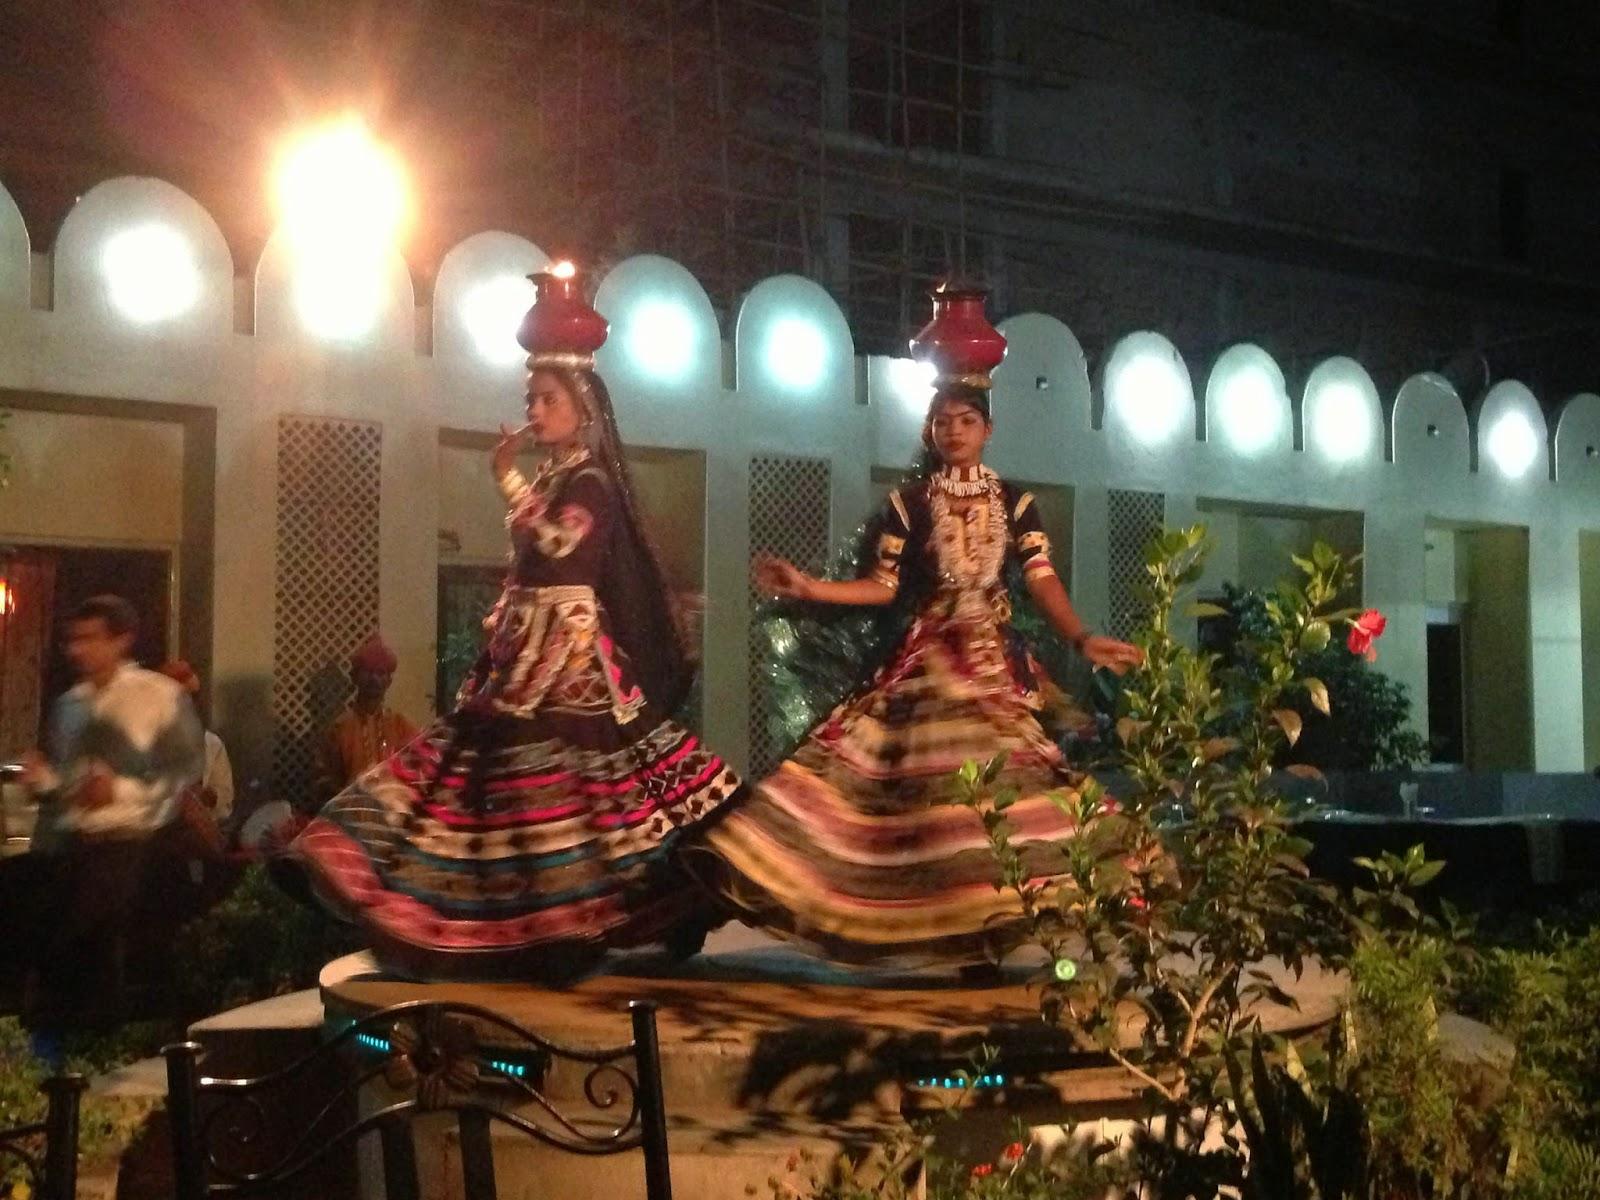 19 RESTAURANTE DURG JAIPUR danças típicas rajasthani - rajastao india